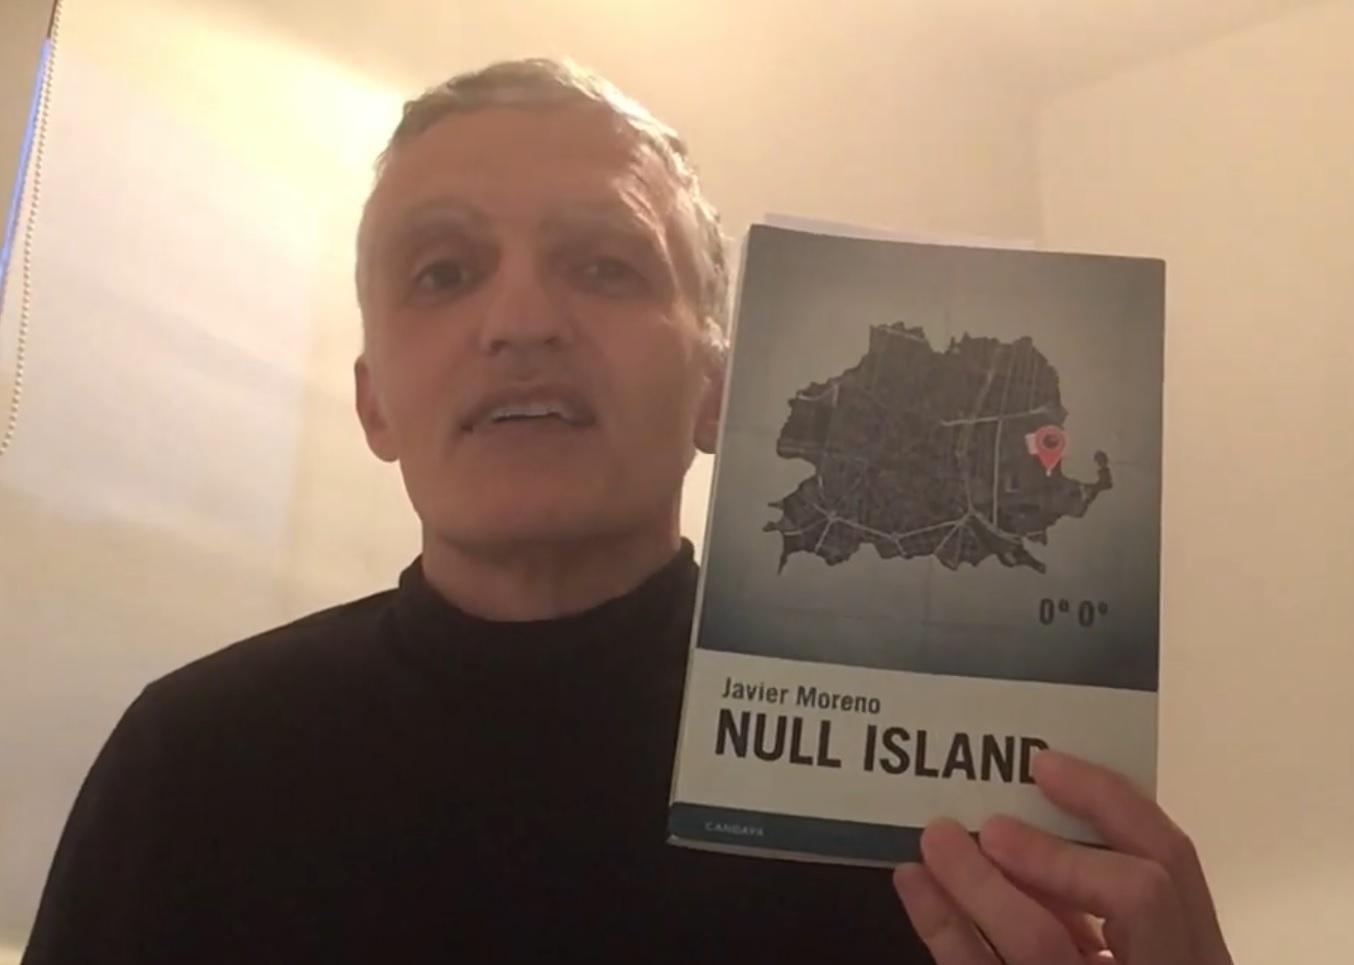 VIDEO RESEÑA DE NULL ISLAND DE JAVIER MORENO. CARLOS GÁMEZ PÉREZ